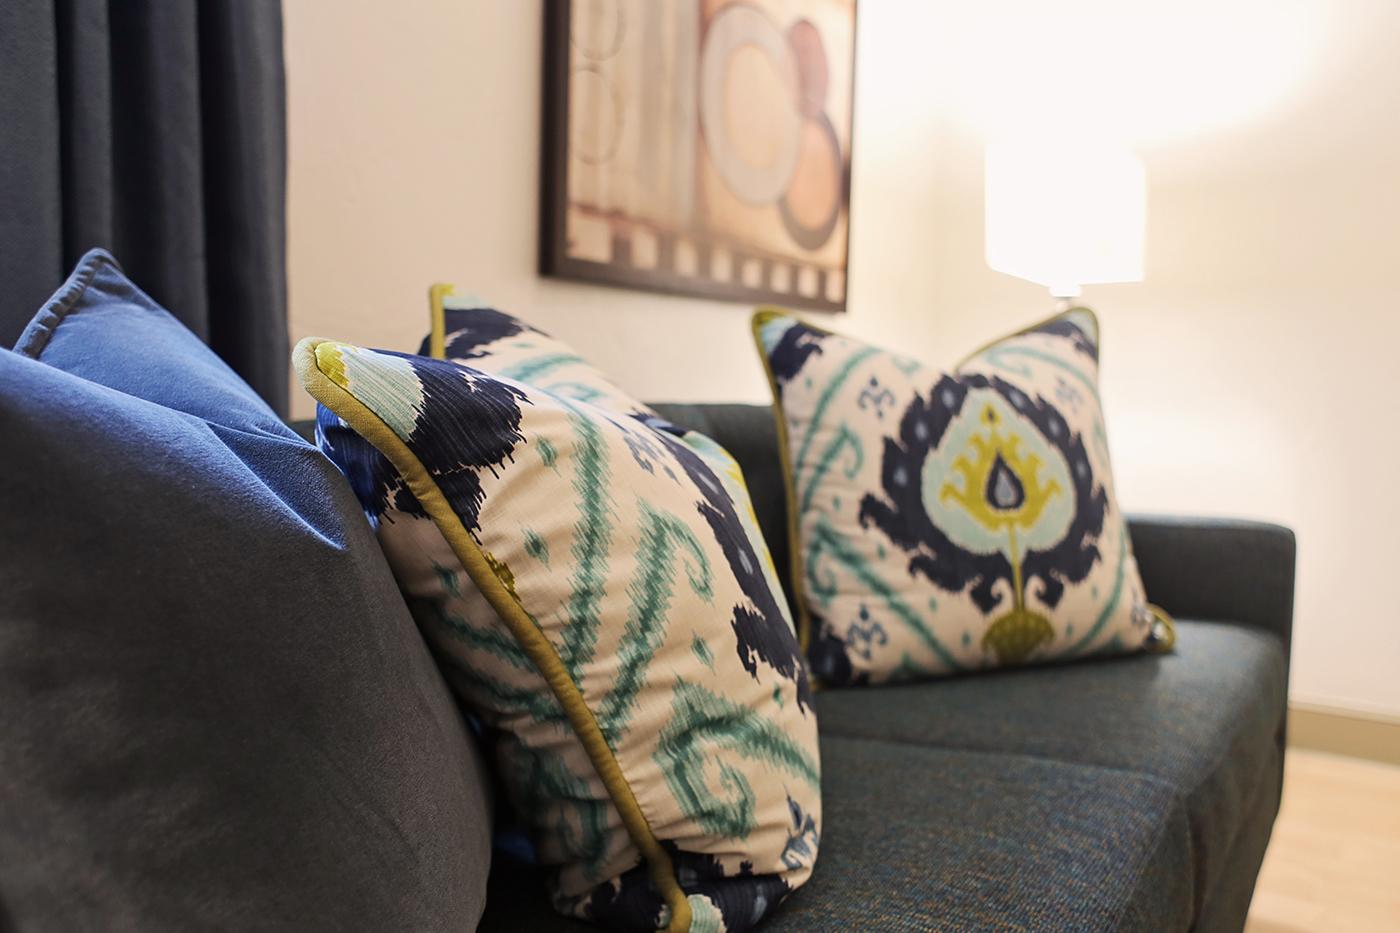 Douglass two bedroom couch.jpg